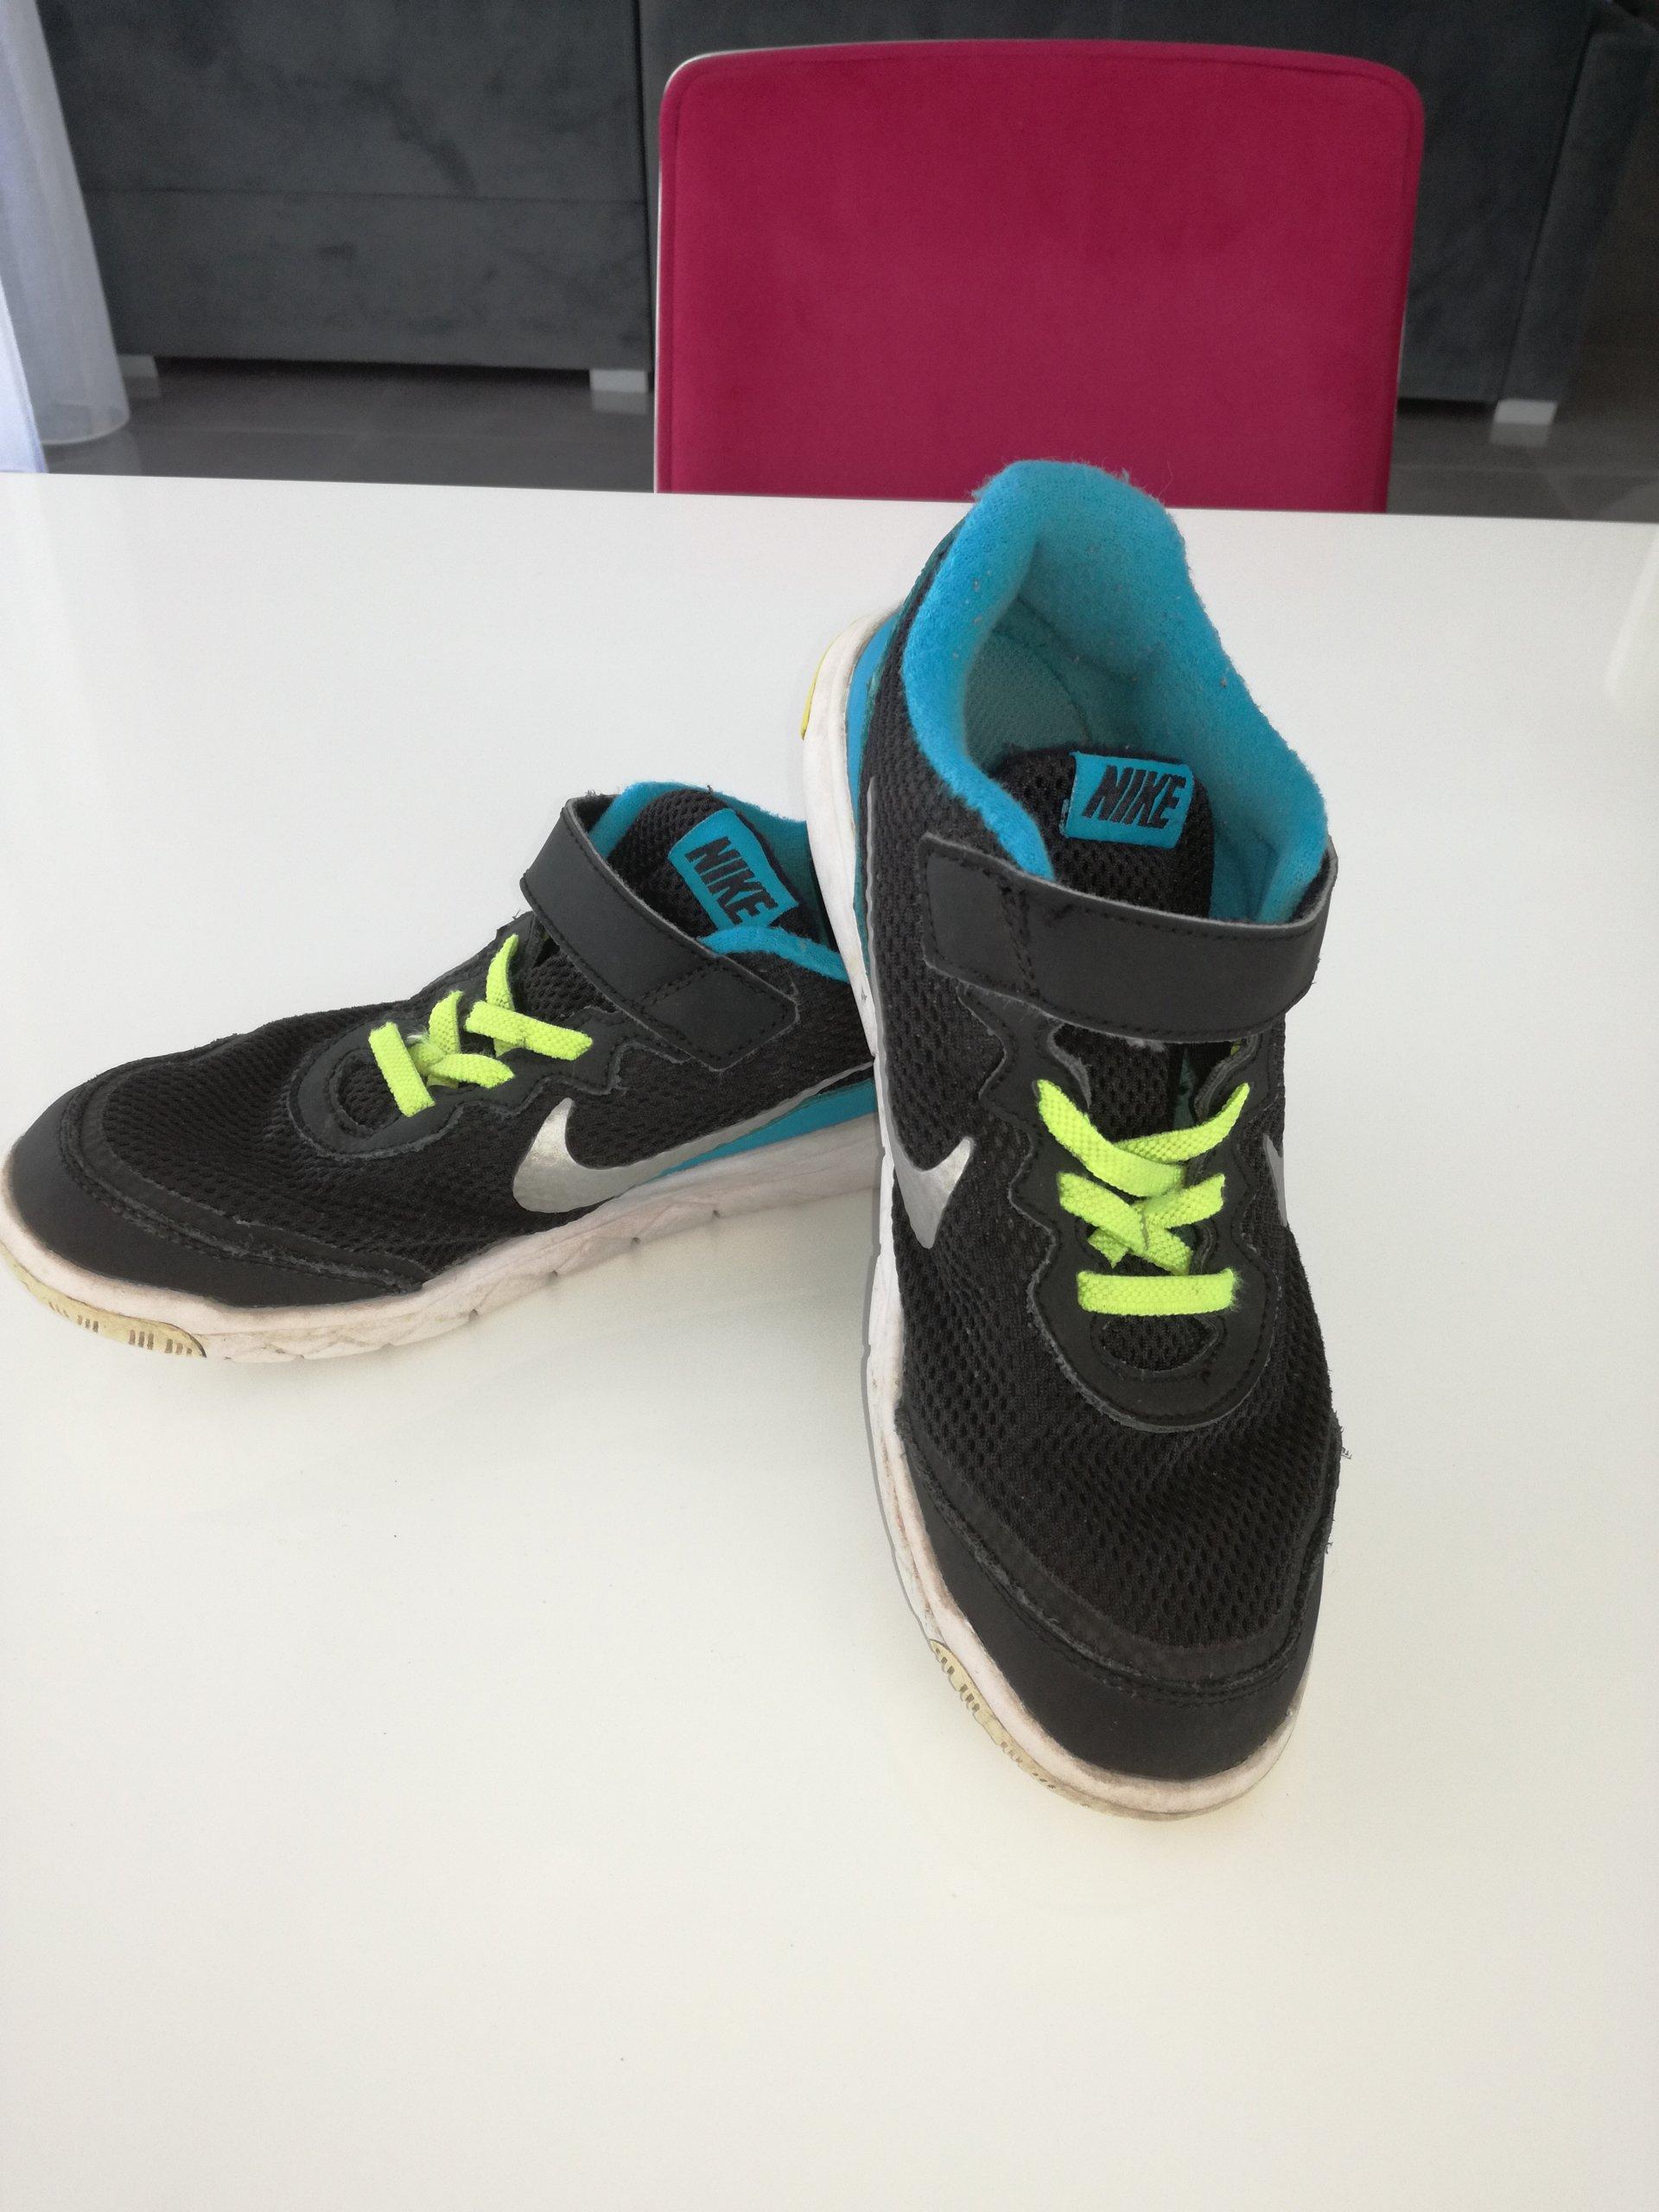 buy online 2da99 d0b55 Letnie adidasy firmy Nike. Super lekkie!